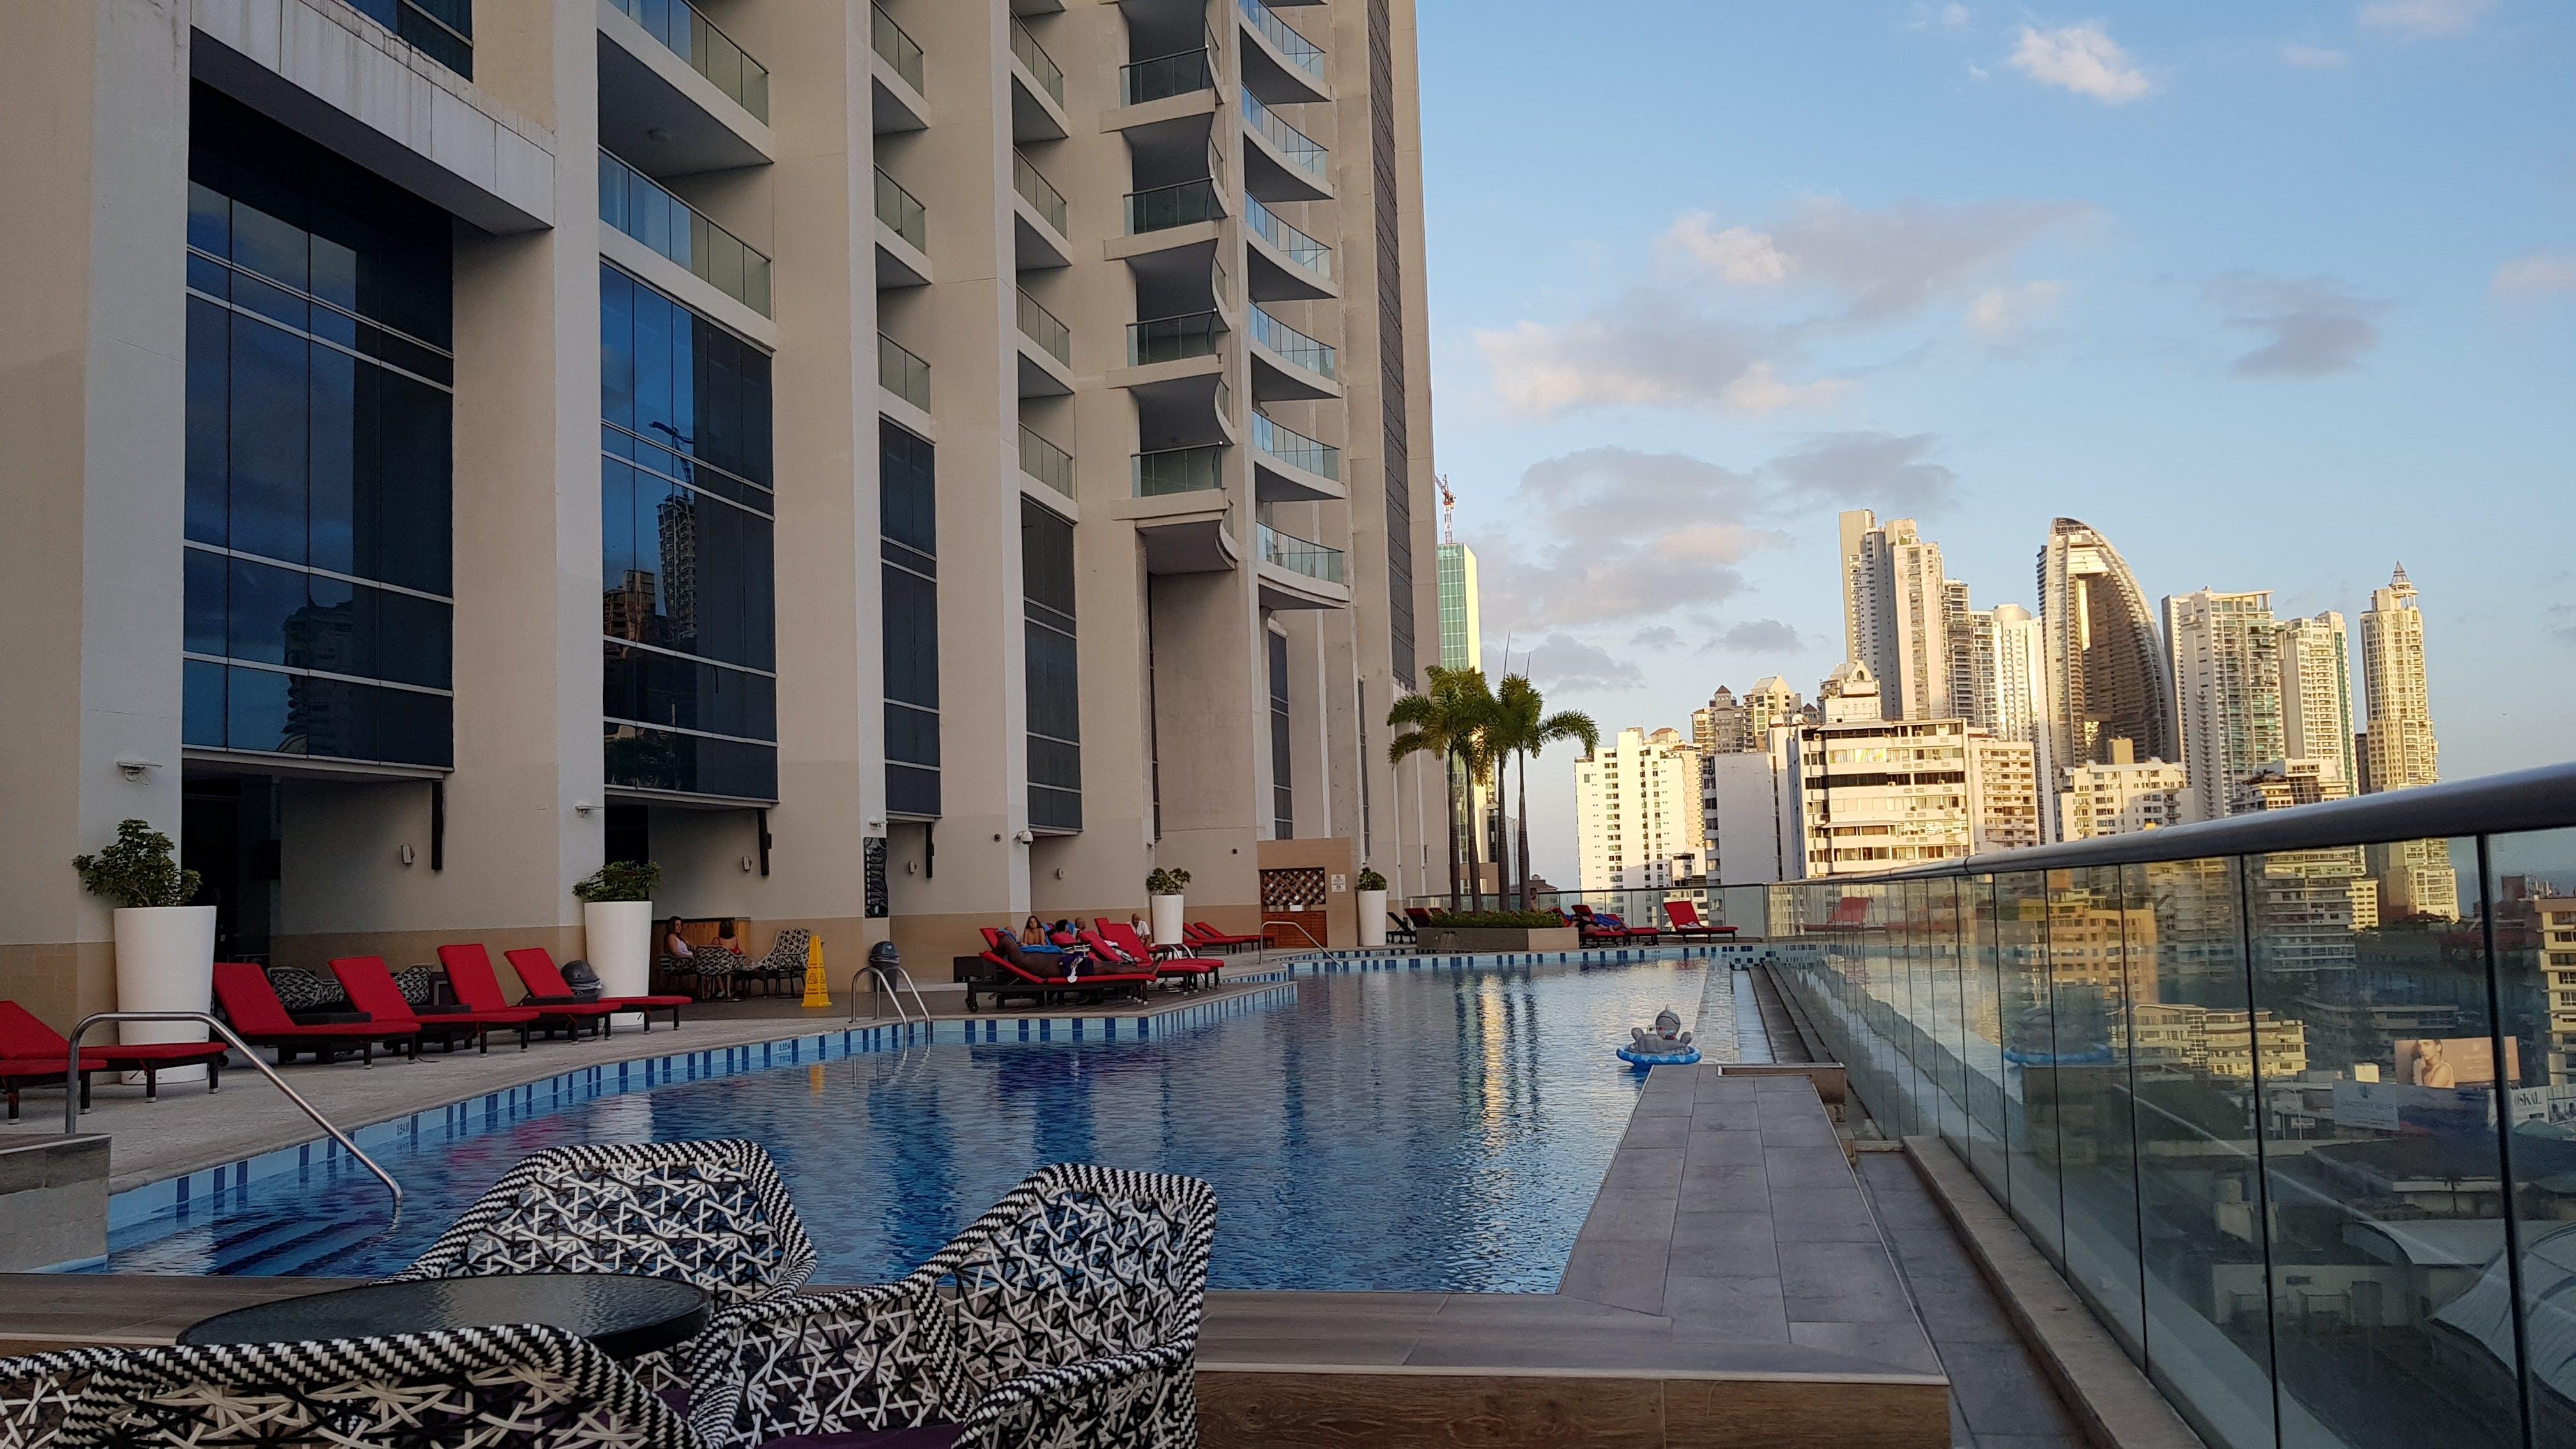 Free stock photo of Hardrock Hotel, inepro, panama, swinmming pool